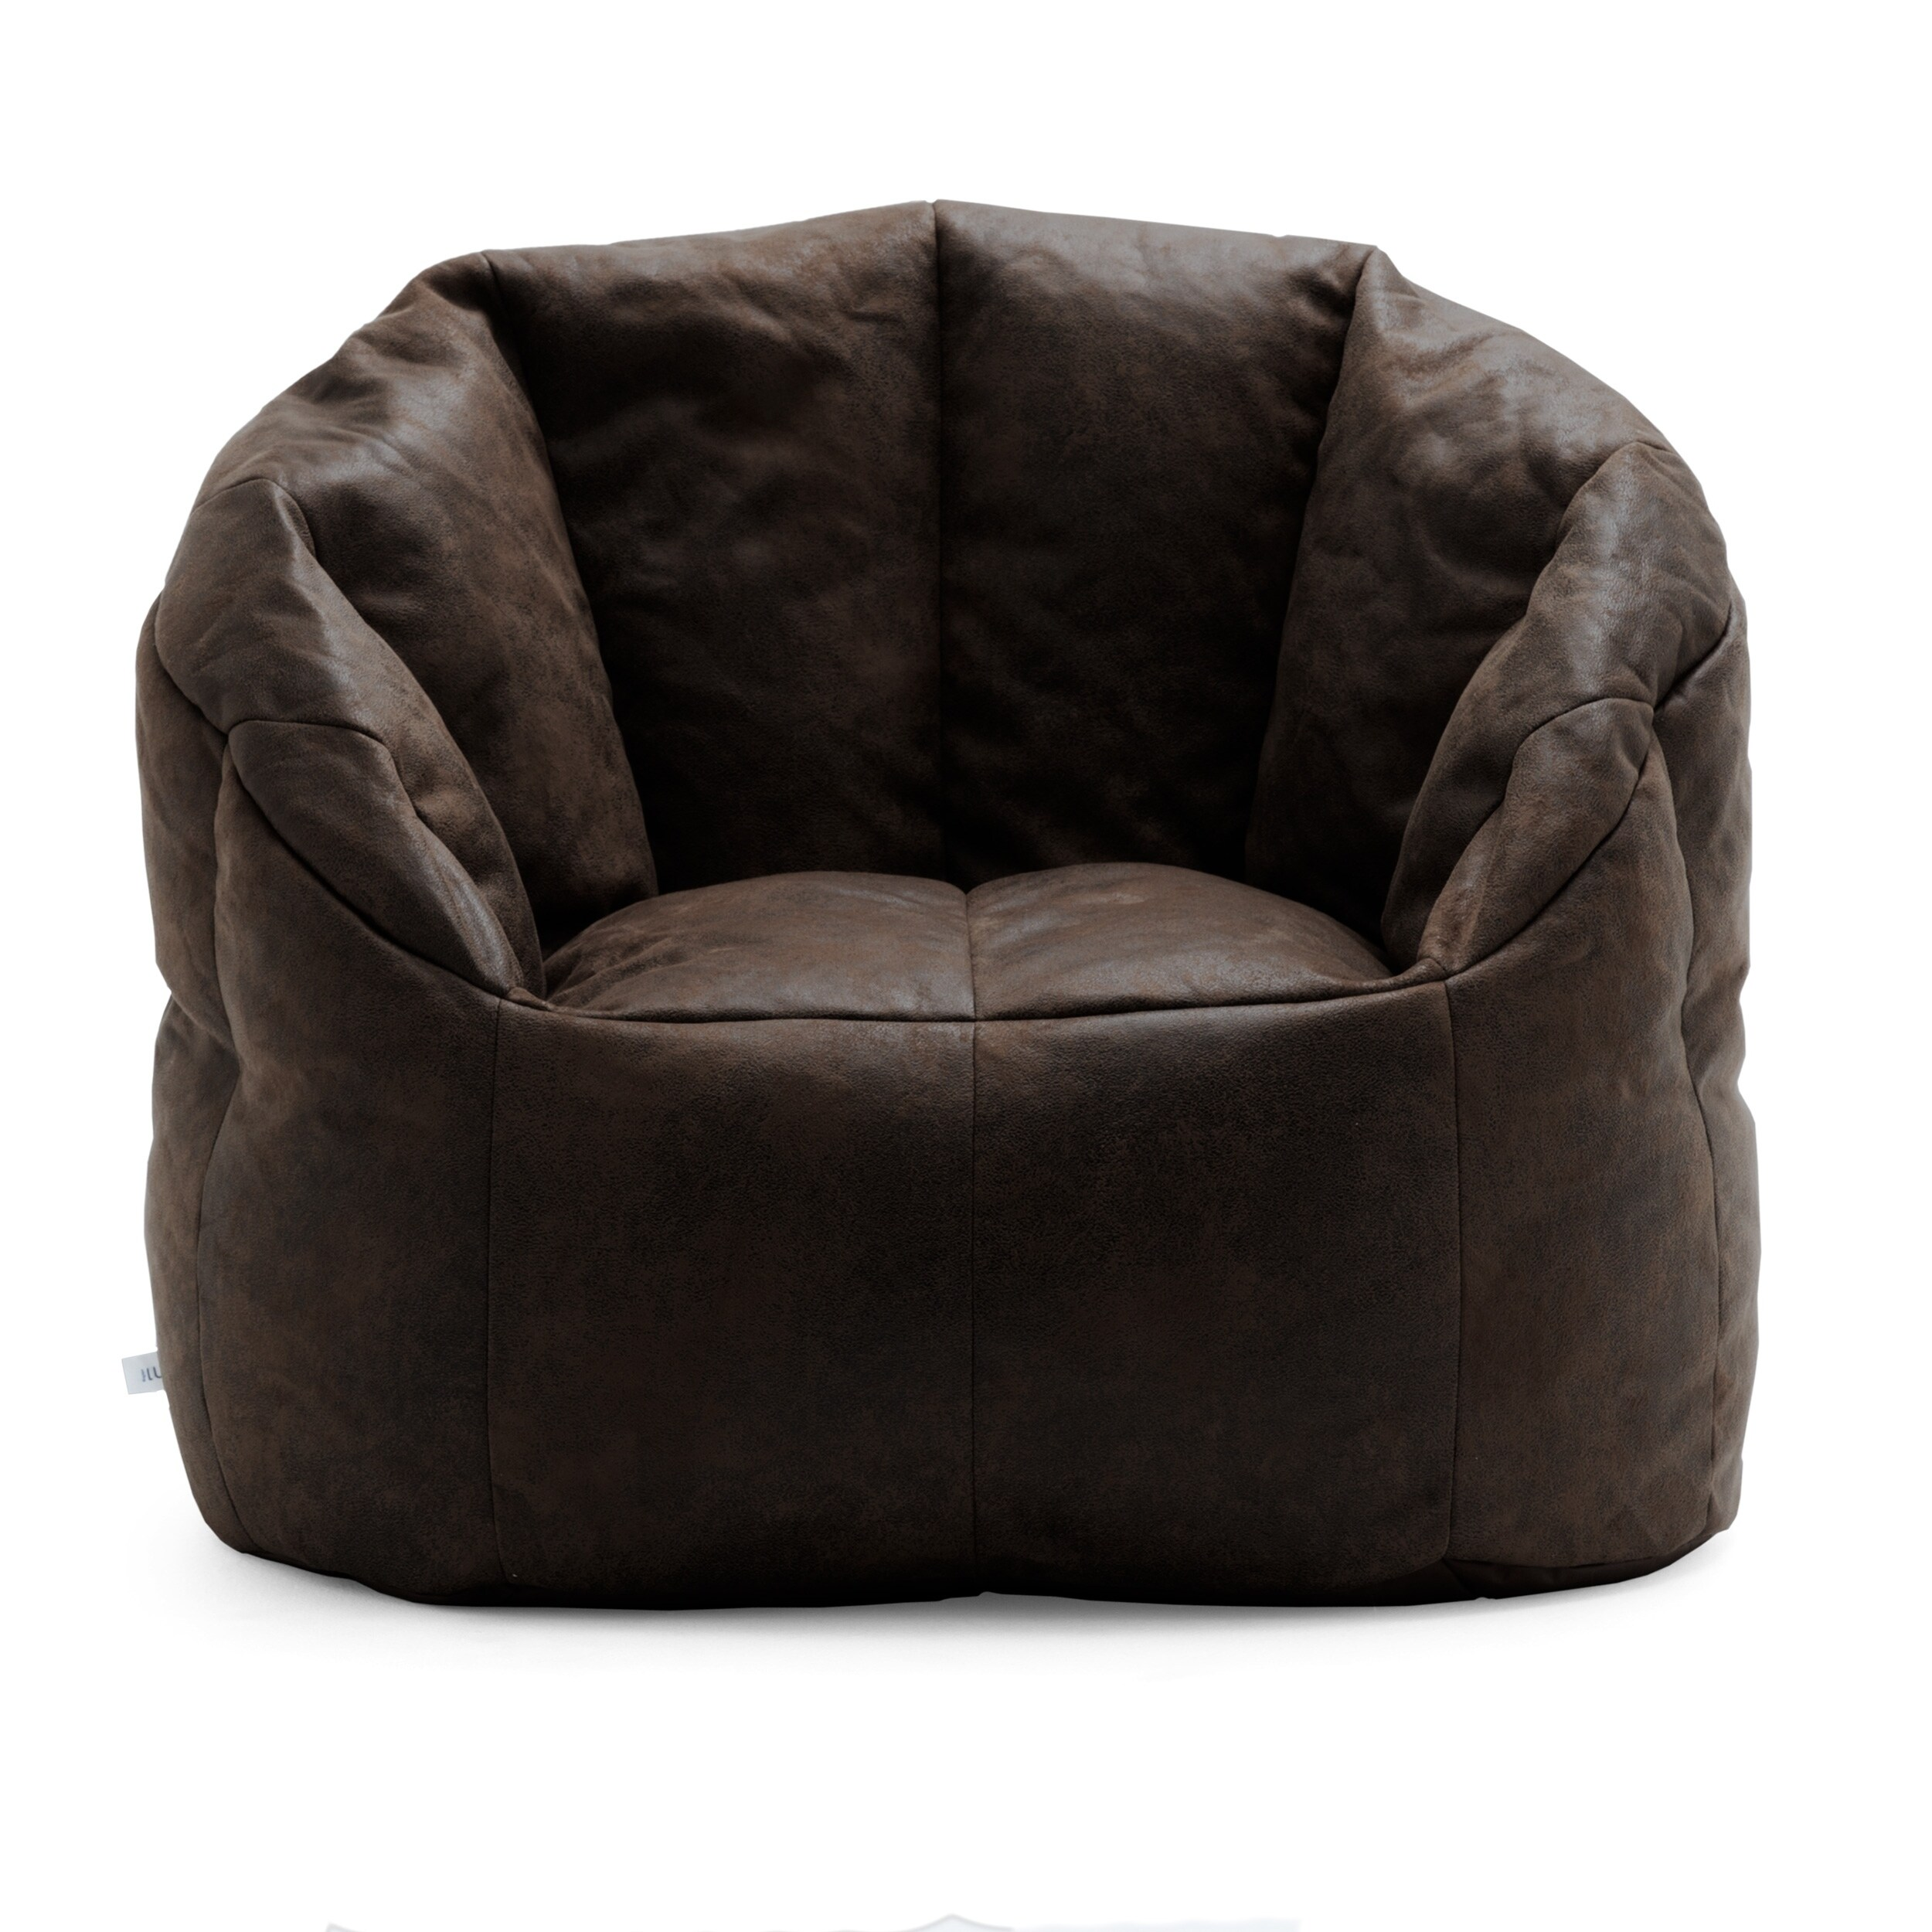 Big Joe Lux Large Milano Blazer Bean Bag Chair, Multiple